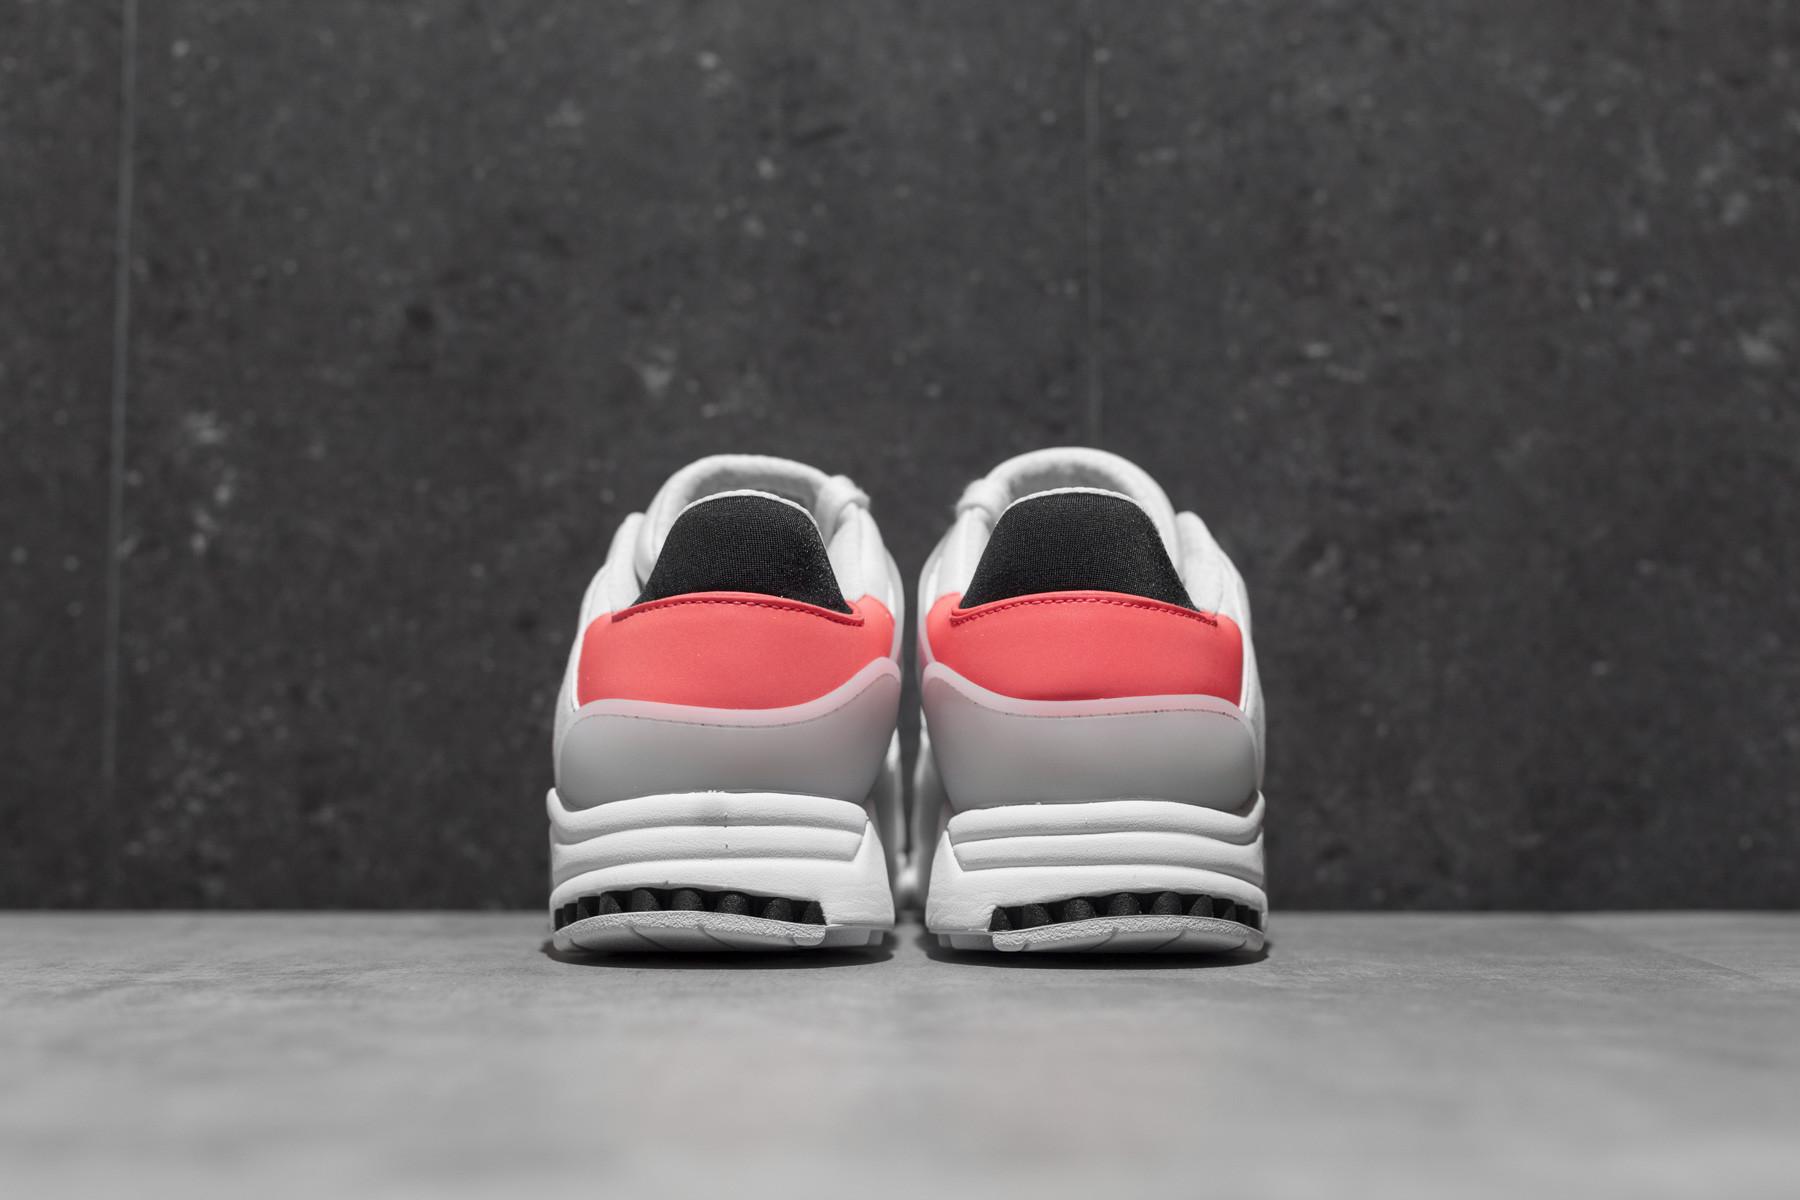 adidas eqt support rf sneakers. Black Bedroom Furniture Sets. Home Design Ideas